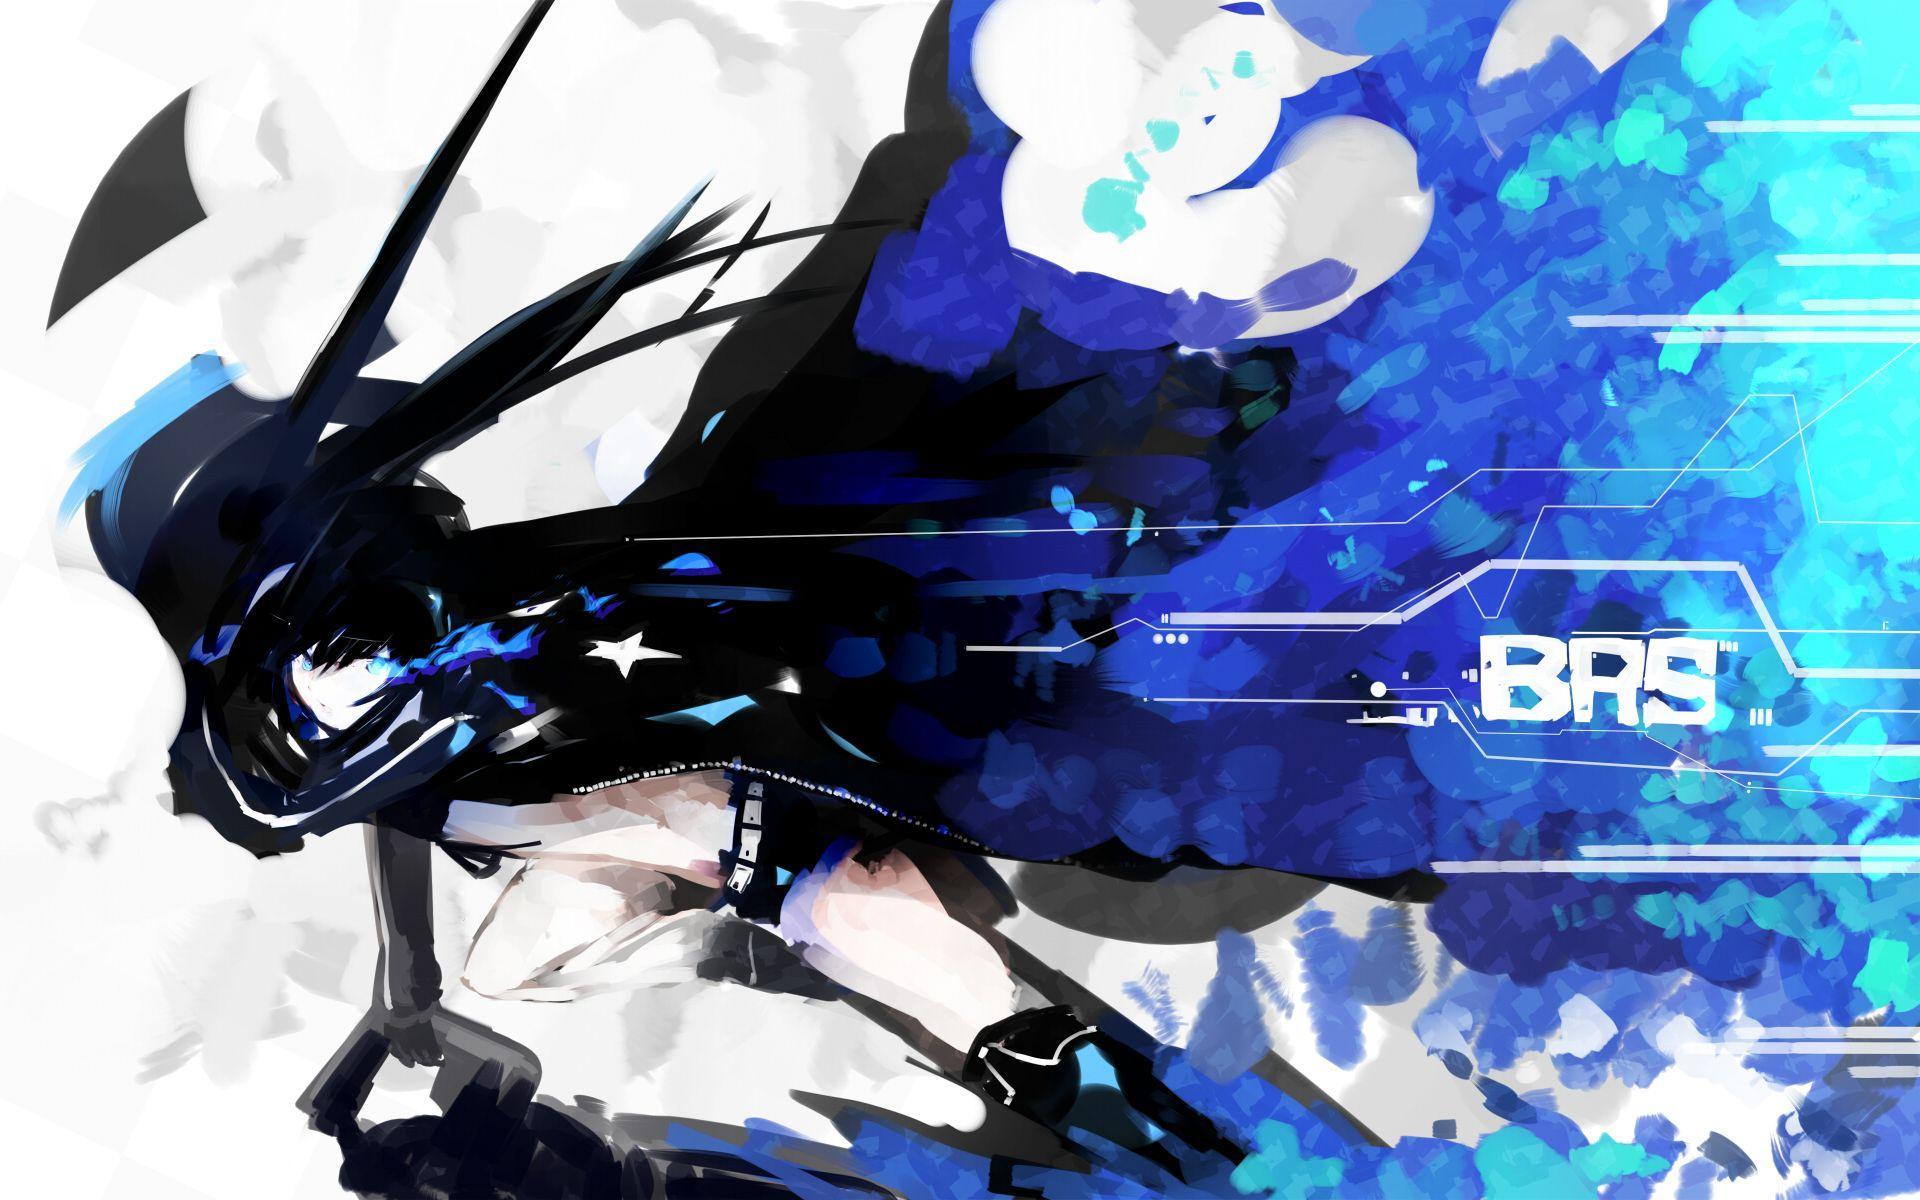 Anime Black Rock Shooter Wallpapers Top Free Anime Black Rock